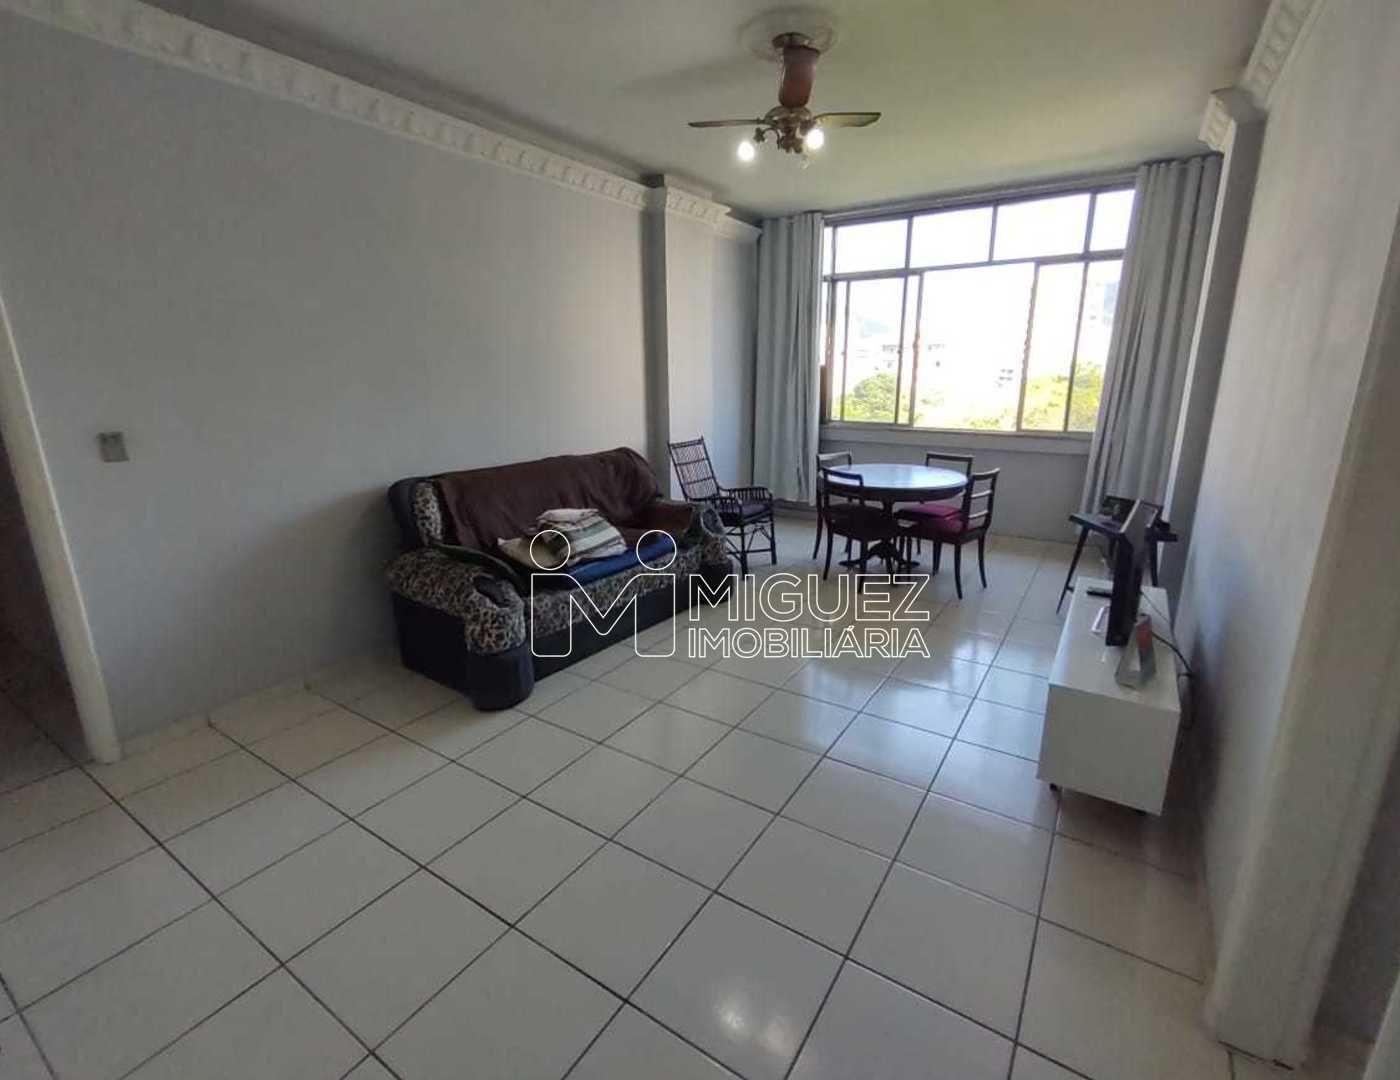 Apartamento, venda, Rua Campos Sales - Tijuca , Rio de janeiro